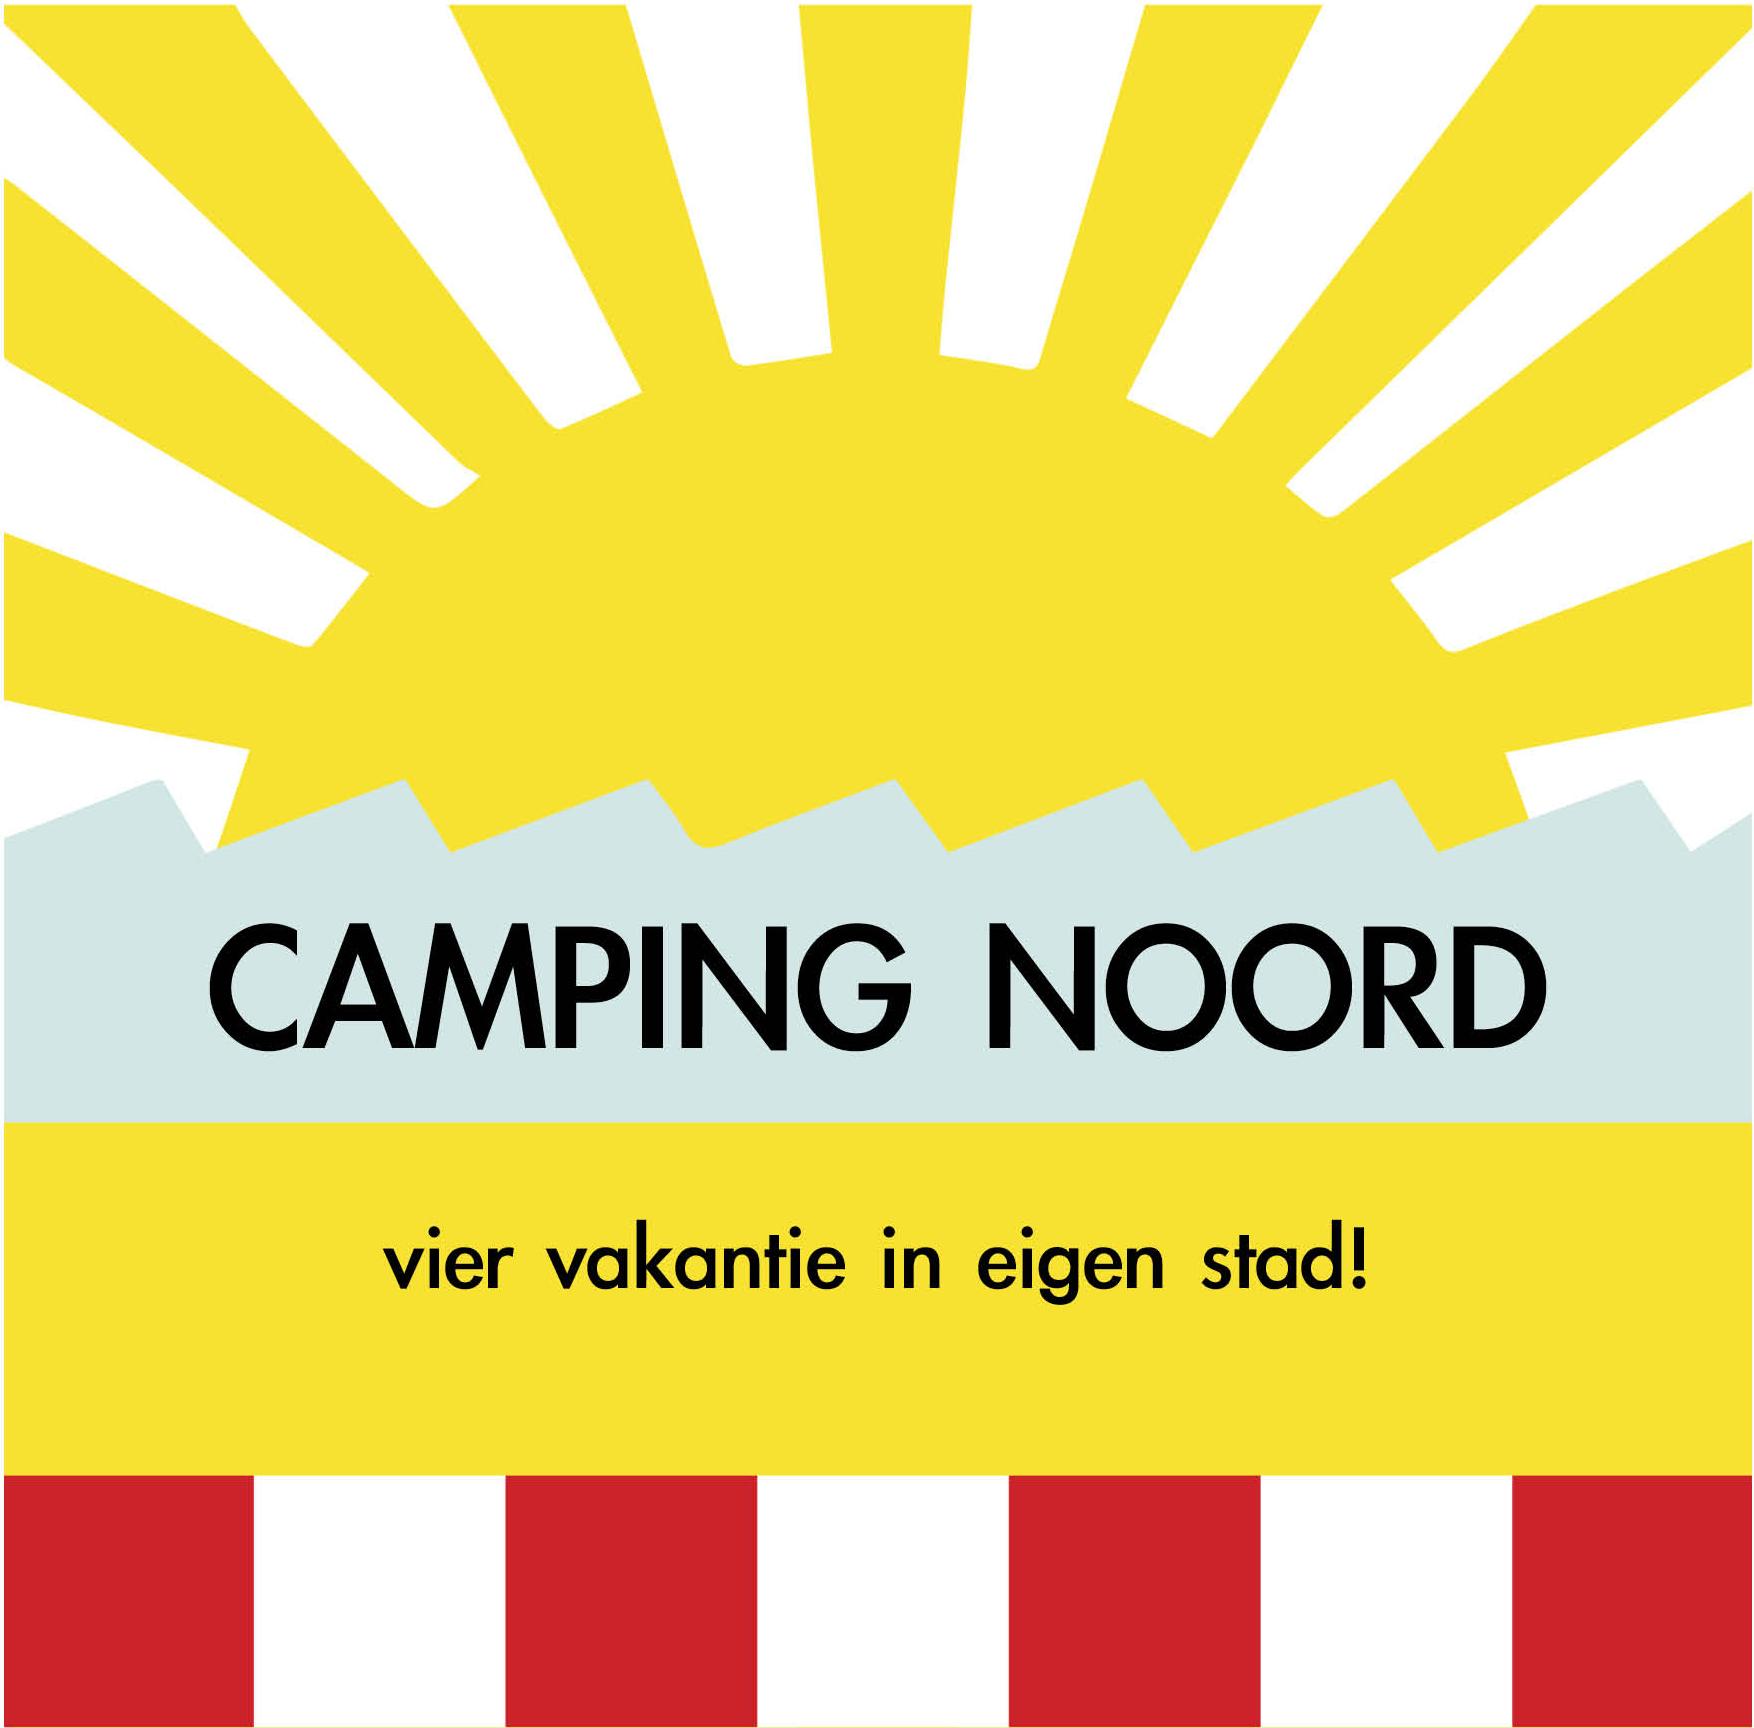 Camping Noord